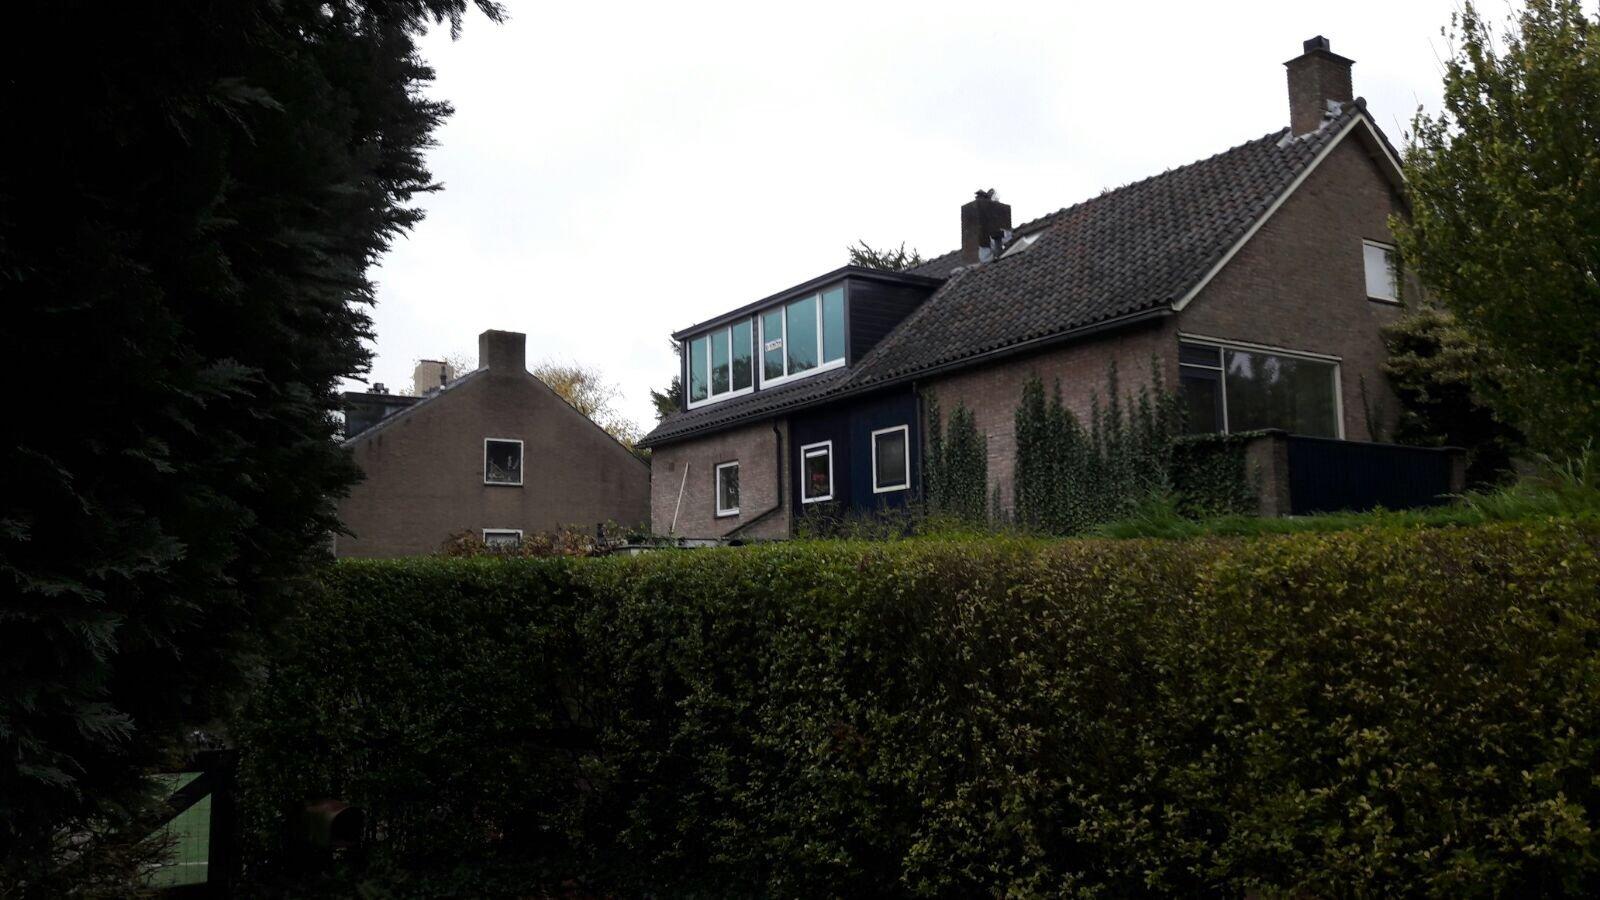 Prachtige Knipping prolux dakkapel gemonteerd te Bilthoven.